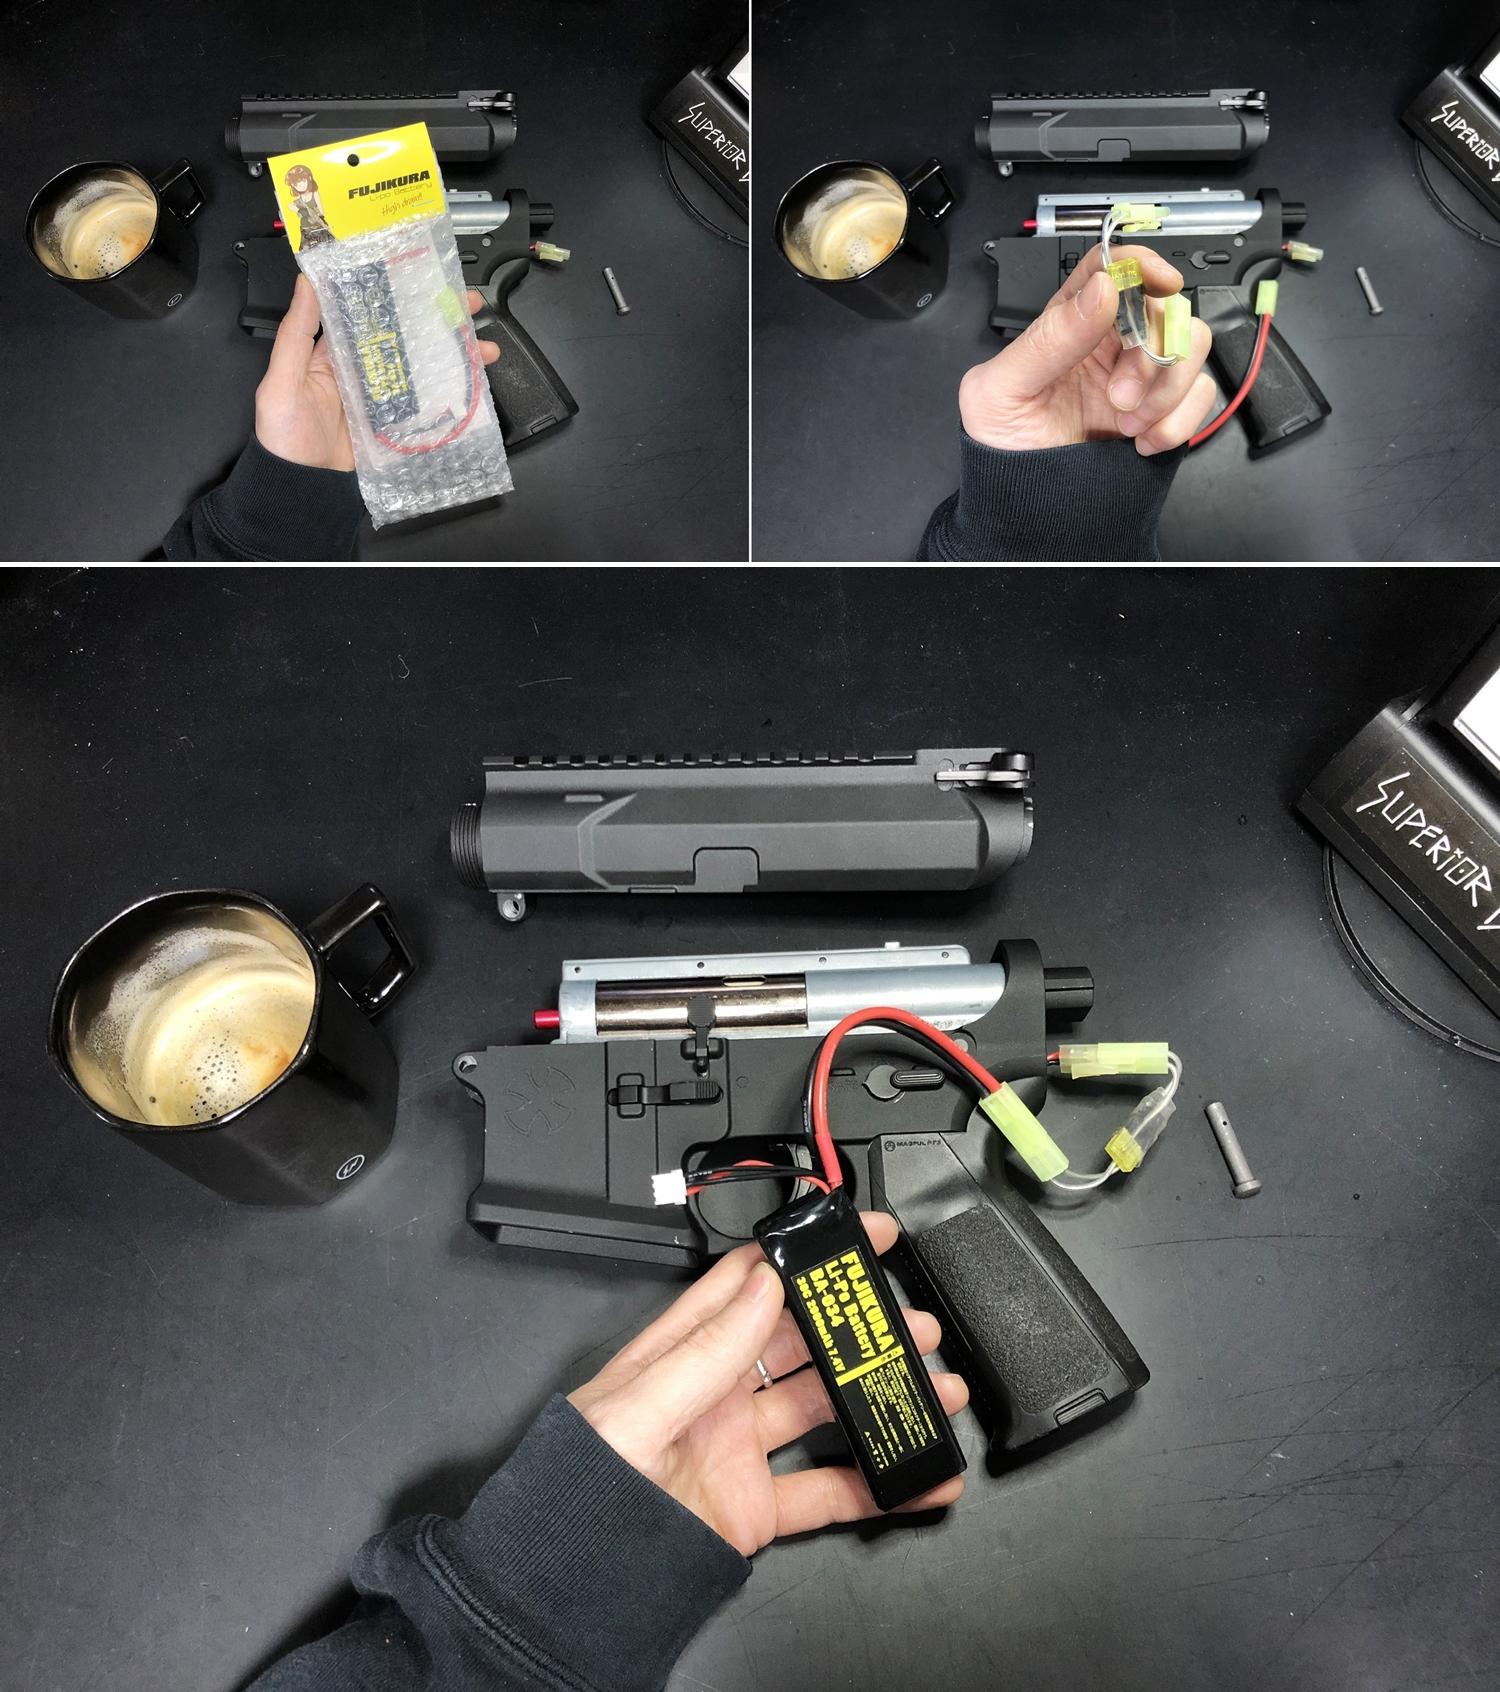 17 NOVESKE GEN3 N4 BY MADBULL!! 『第一弾』 新たにSTD民間系ARを作り始めたいと思います!! STD AR-15 M4 スタンダード 電動ガン マルイ ノベスケ ノベスキー マットブル メタルフレーム 動作テスト 組込 取付 カス